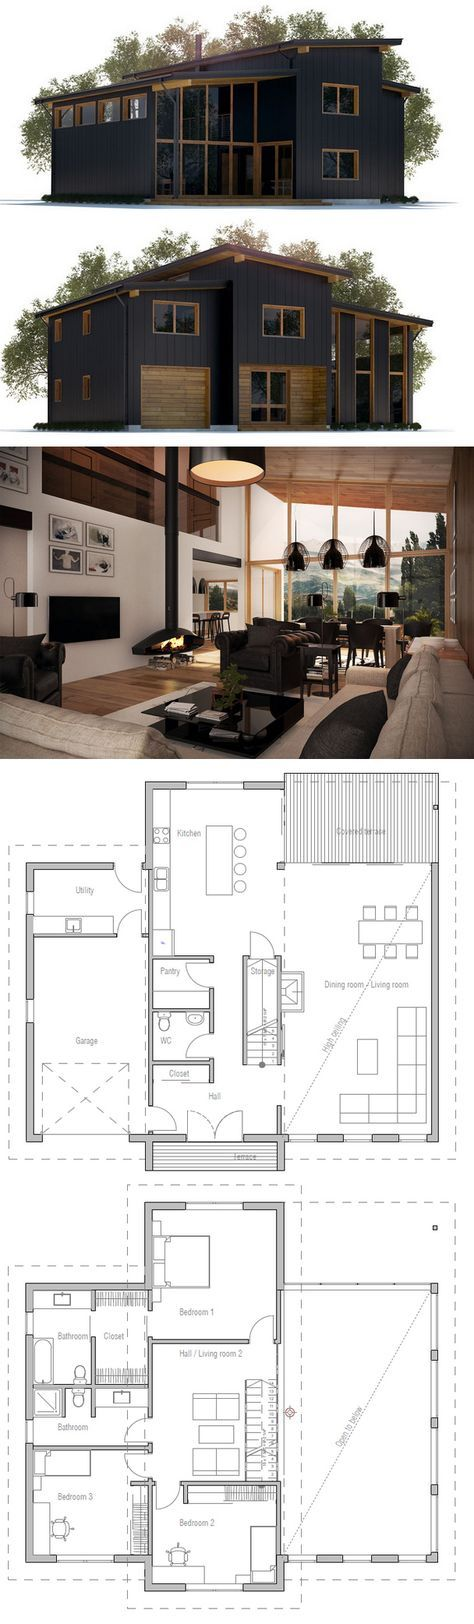 Home Plan                                                                                                                                                                                 More